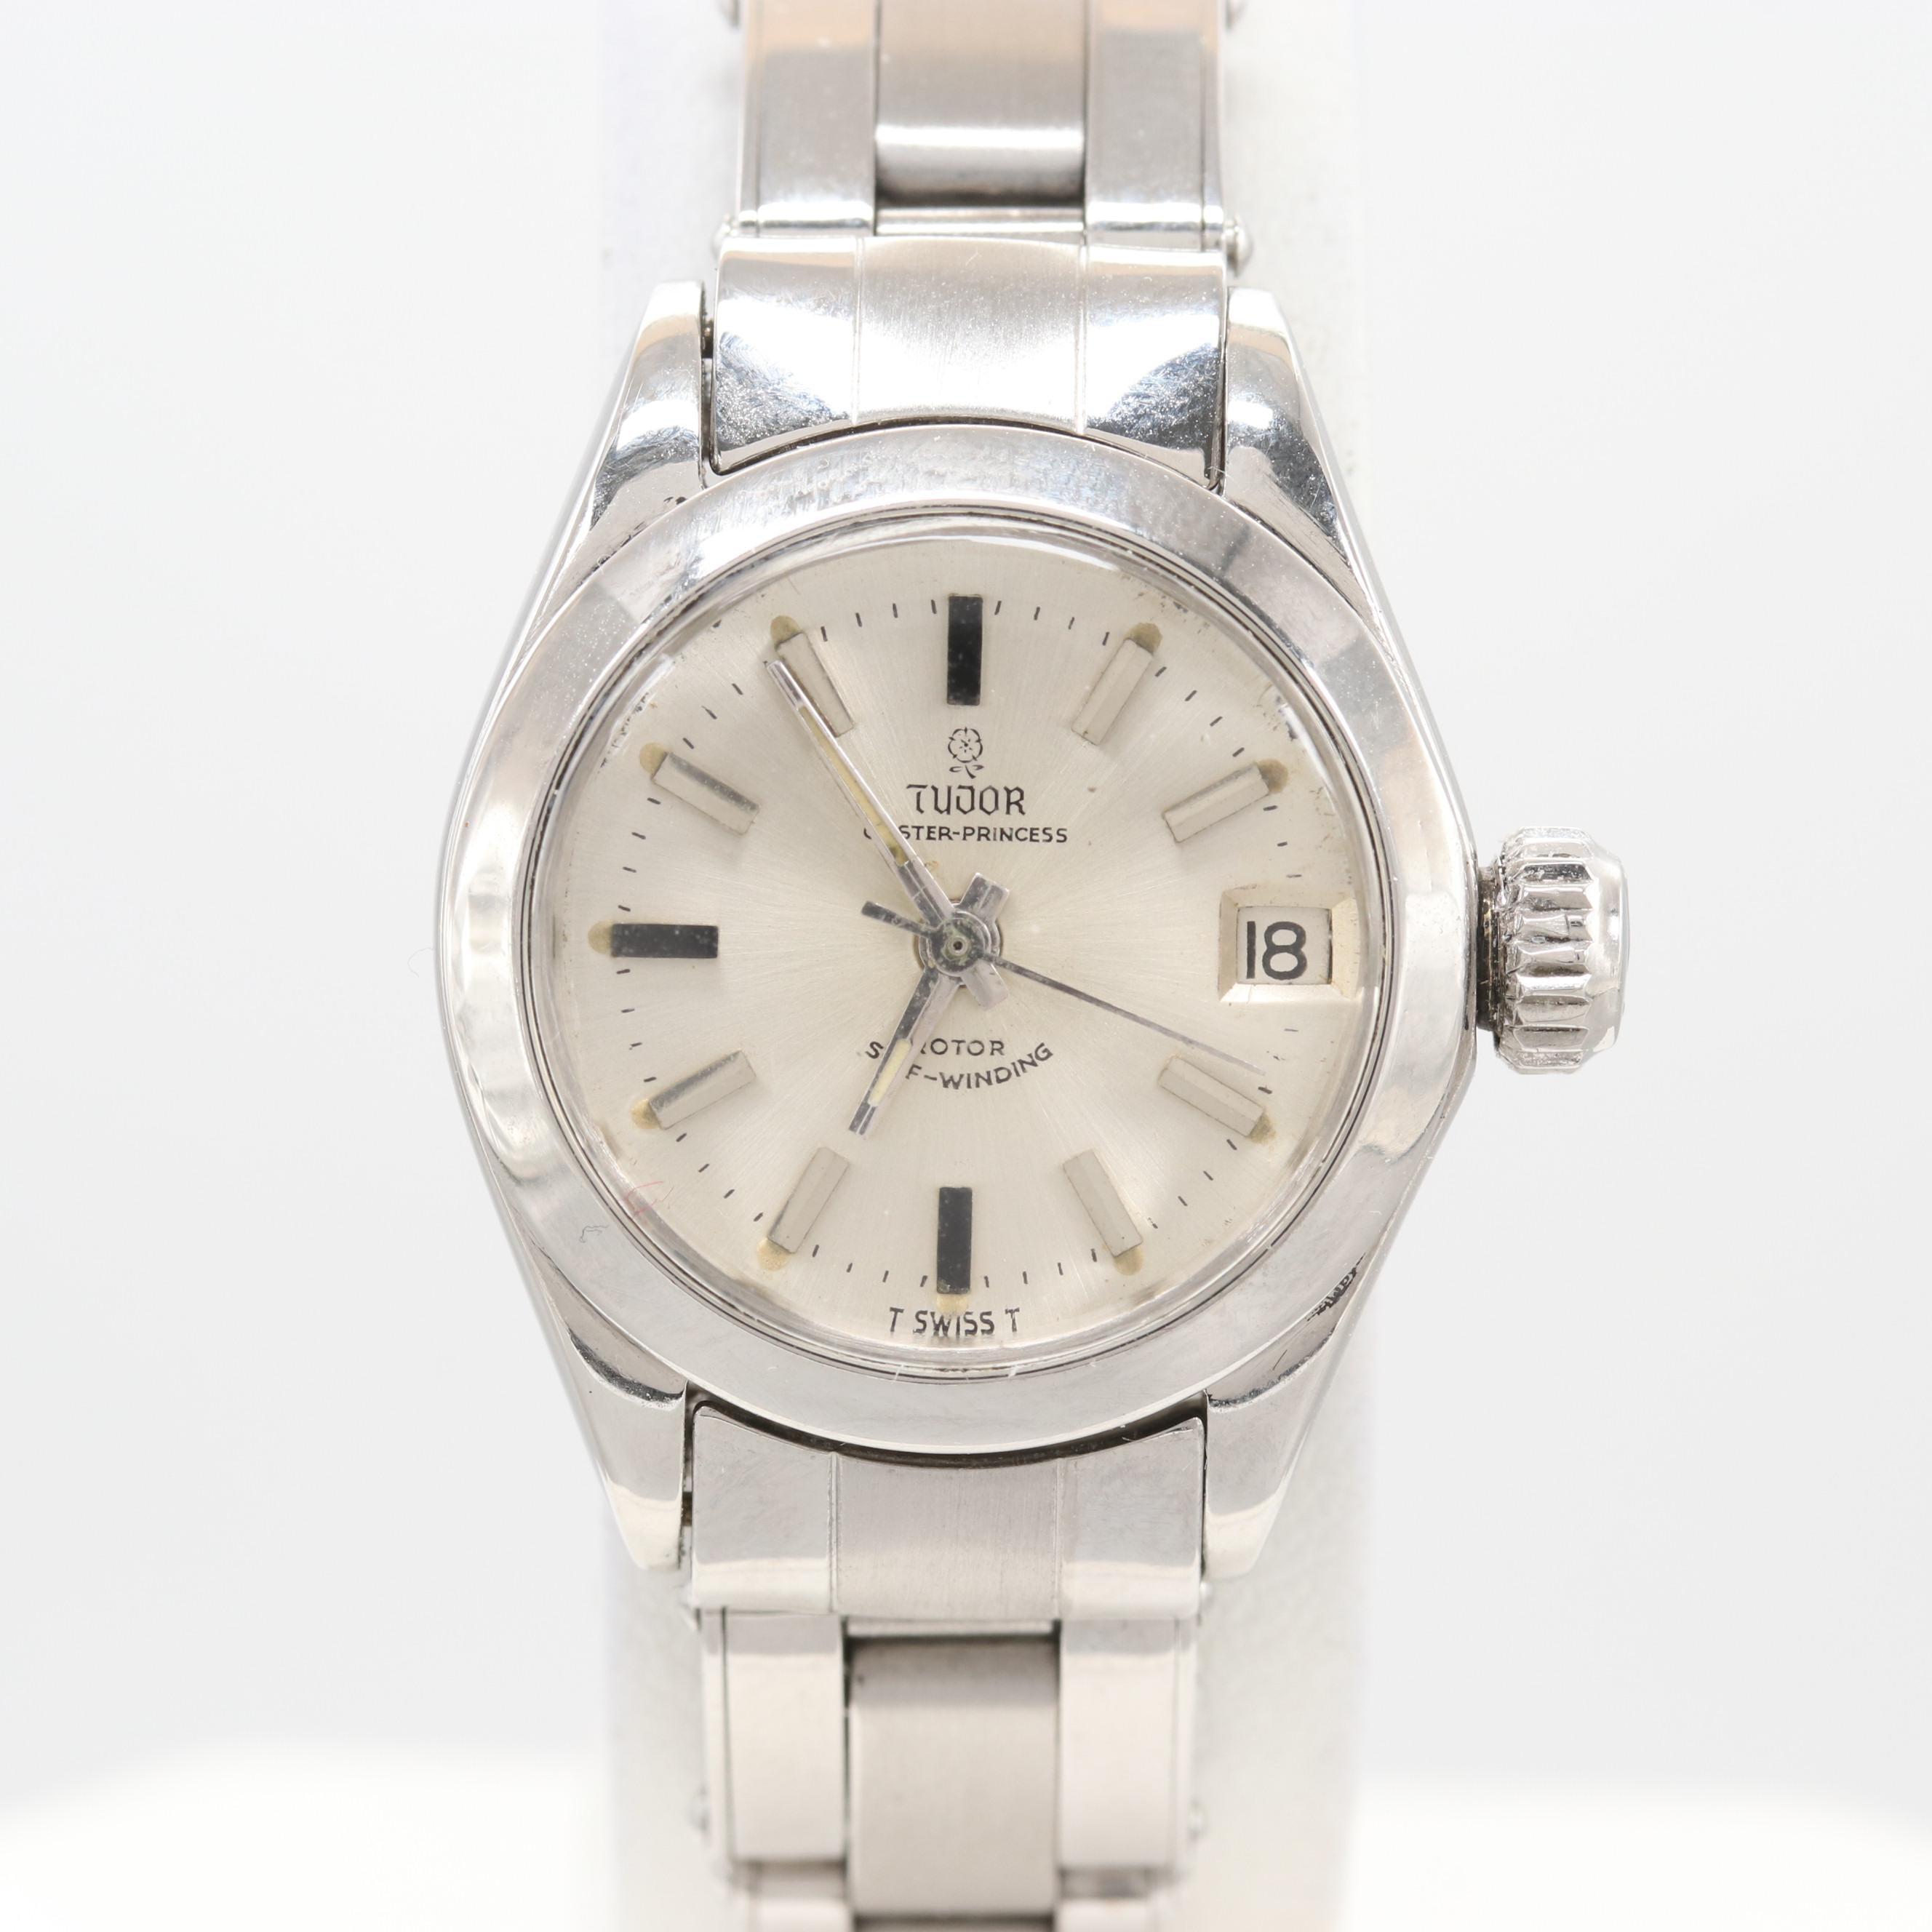 Circa 1968 Tudor Stainless Steel Oyster Princess Model#7576/0 Wristwatch